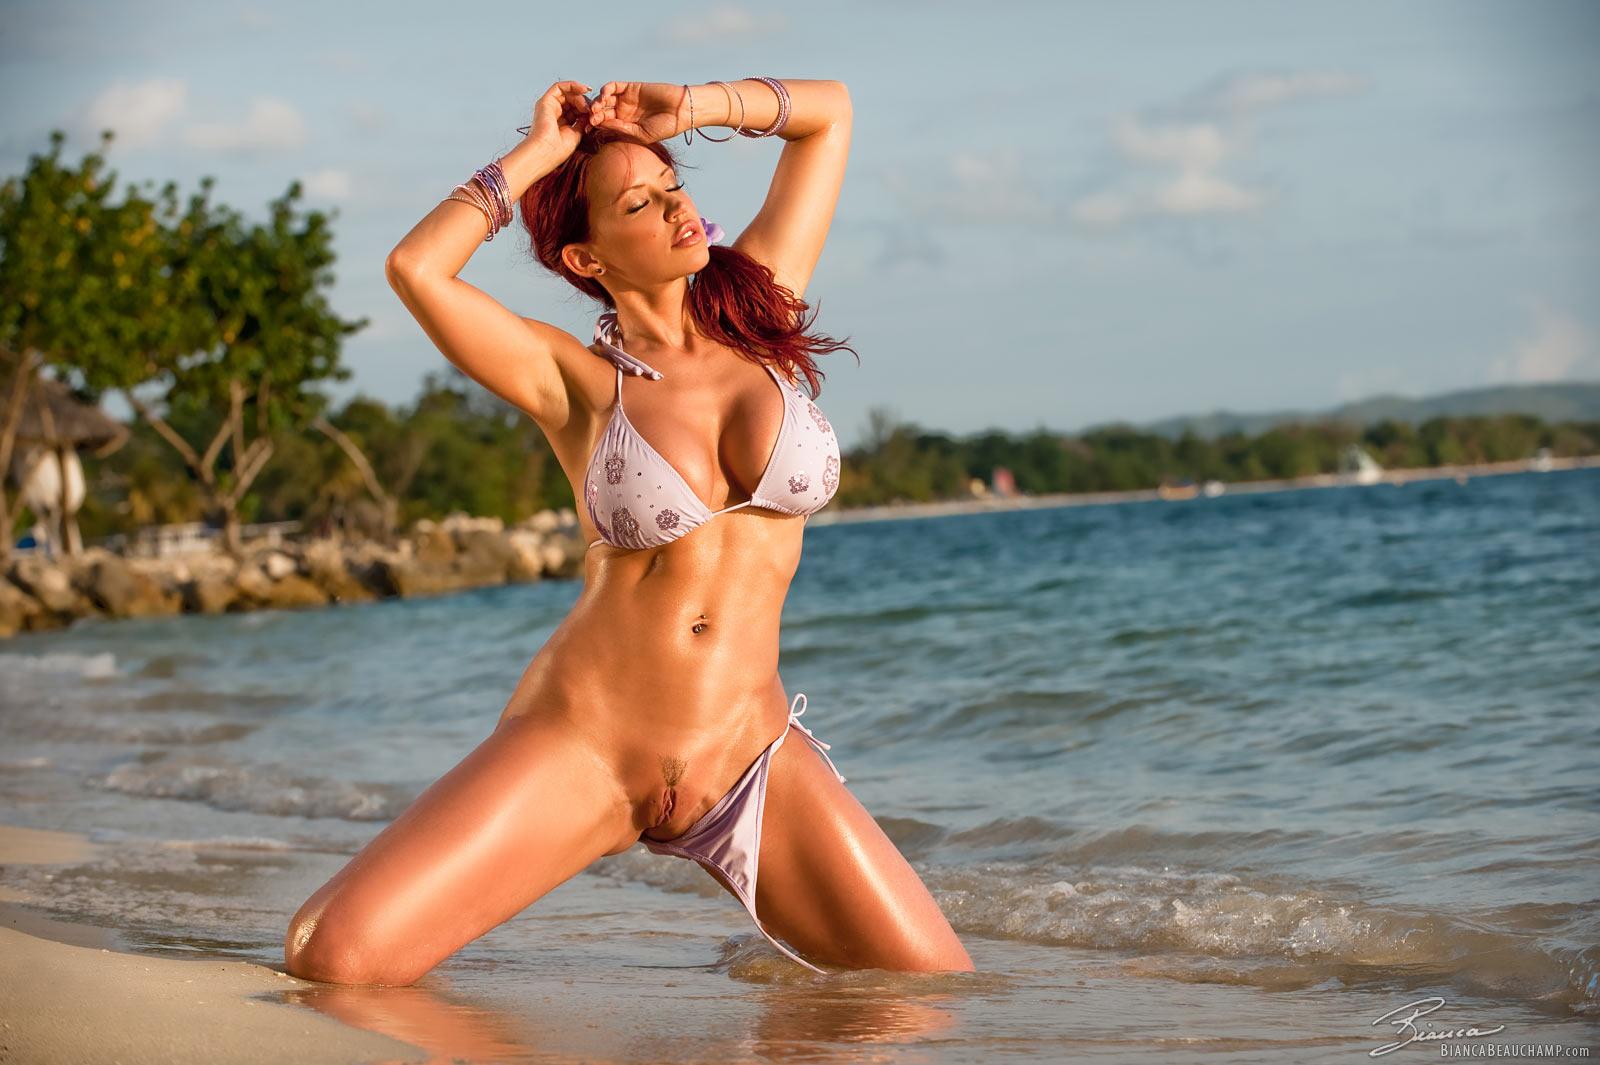 Сиськи в бикини на пляже 8 фотография